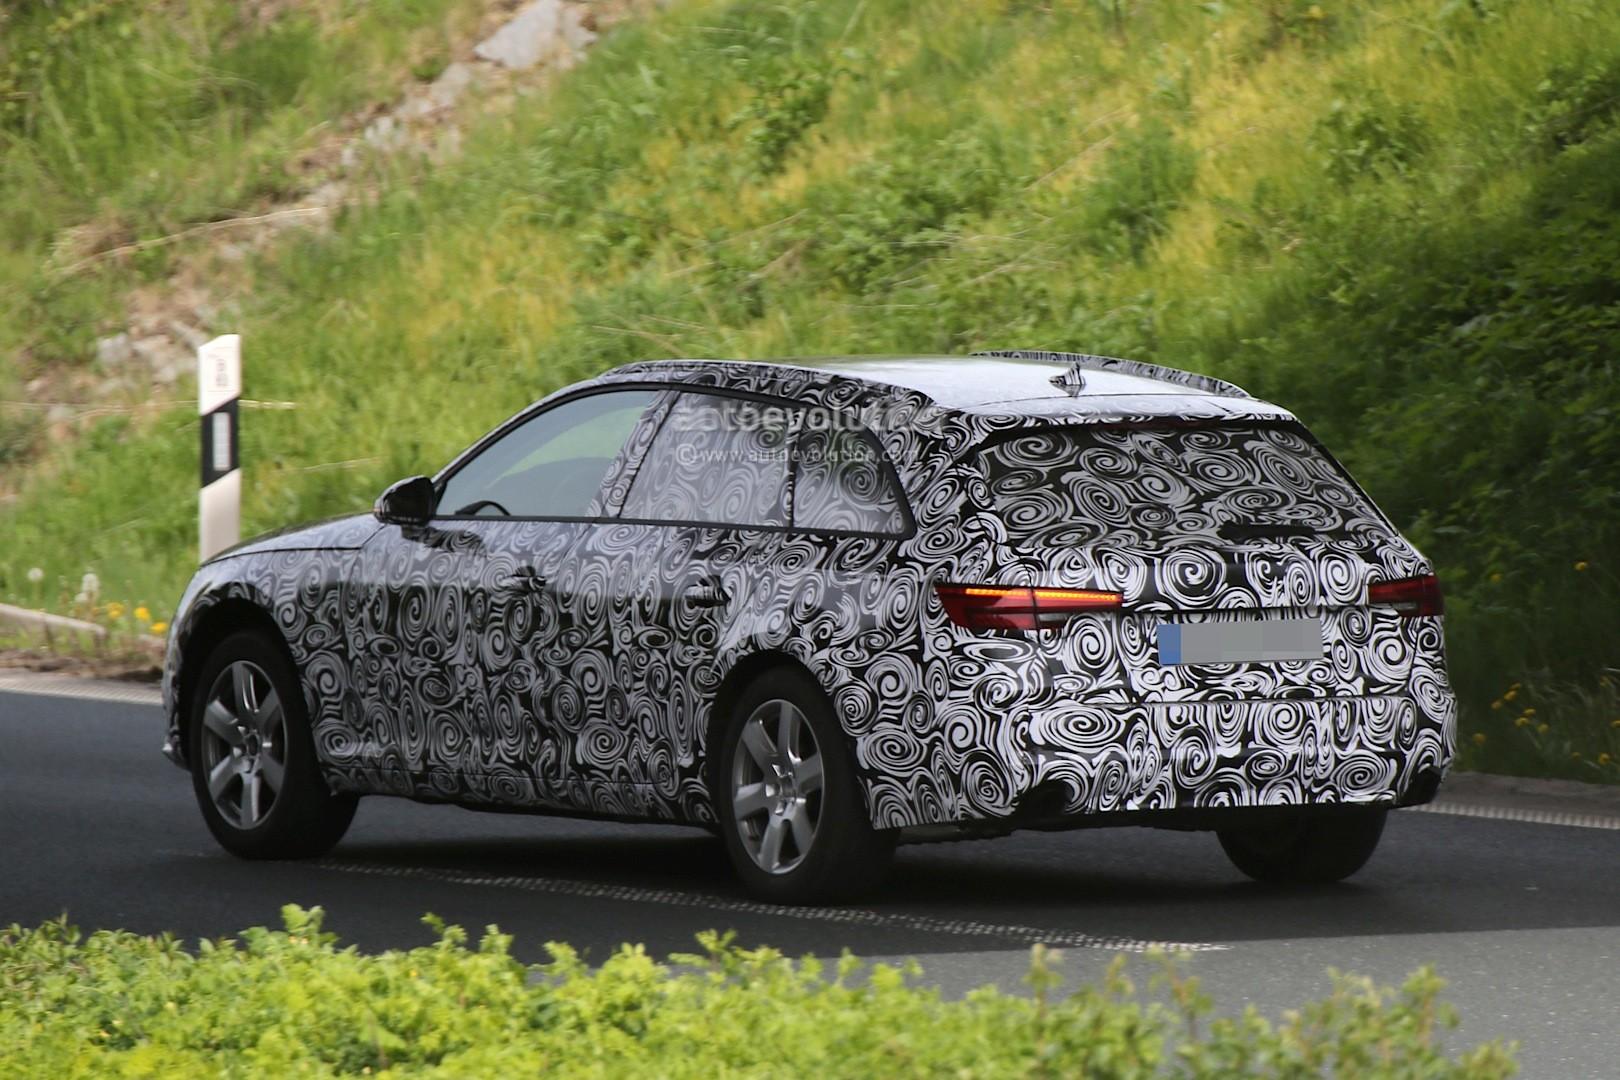 Spyshots 2016 Audi A4 Avant Shows LED Headlights And